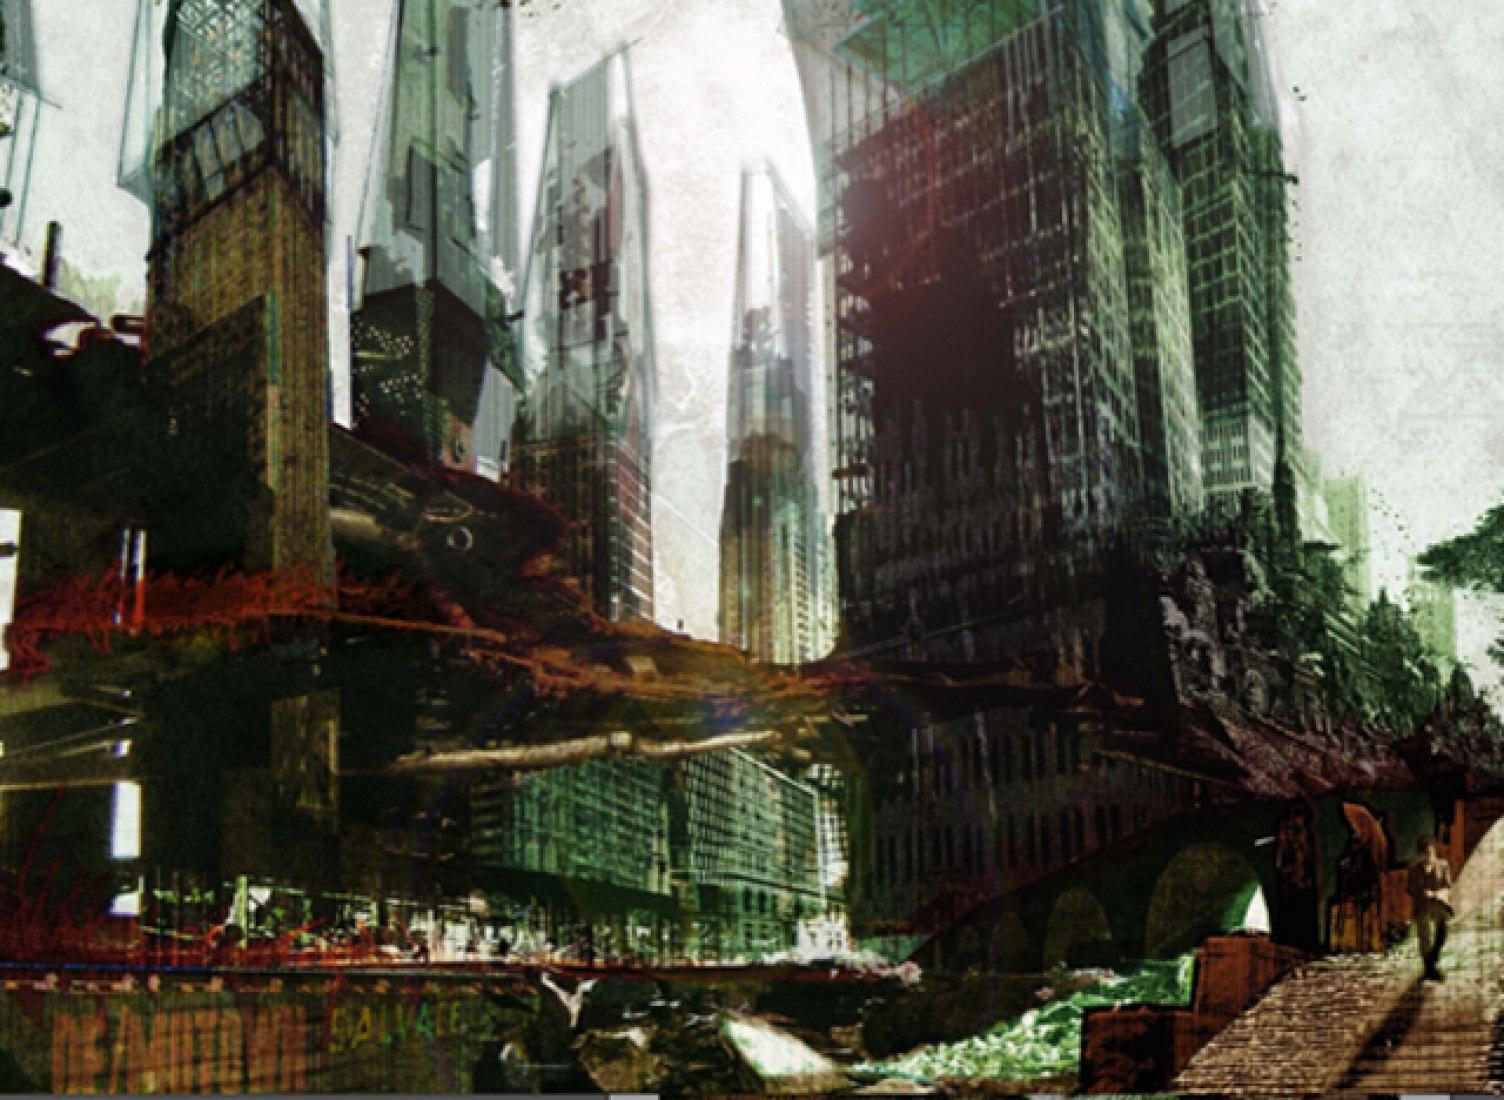 PRIMER PREMIO. Propuesta titulada:  Demotown: A Retroactive Arcology for Detroit. Autor: Honsa, Jesse Foster, Suiza. Coautors:Mahoney, Gregory John, EE.UU.